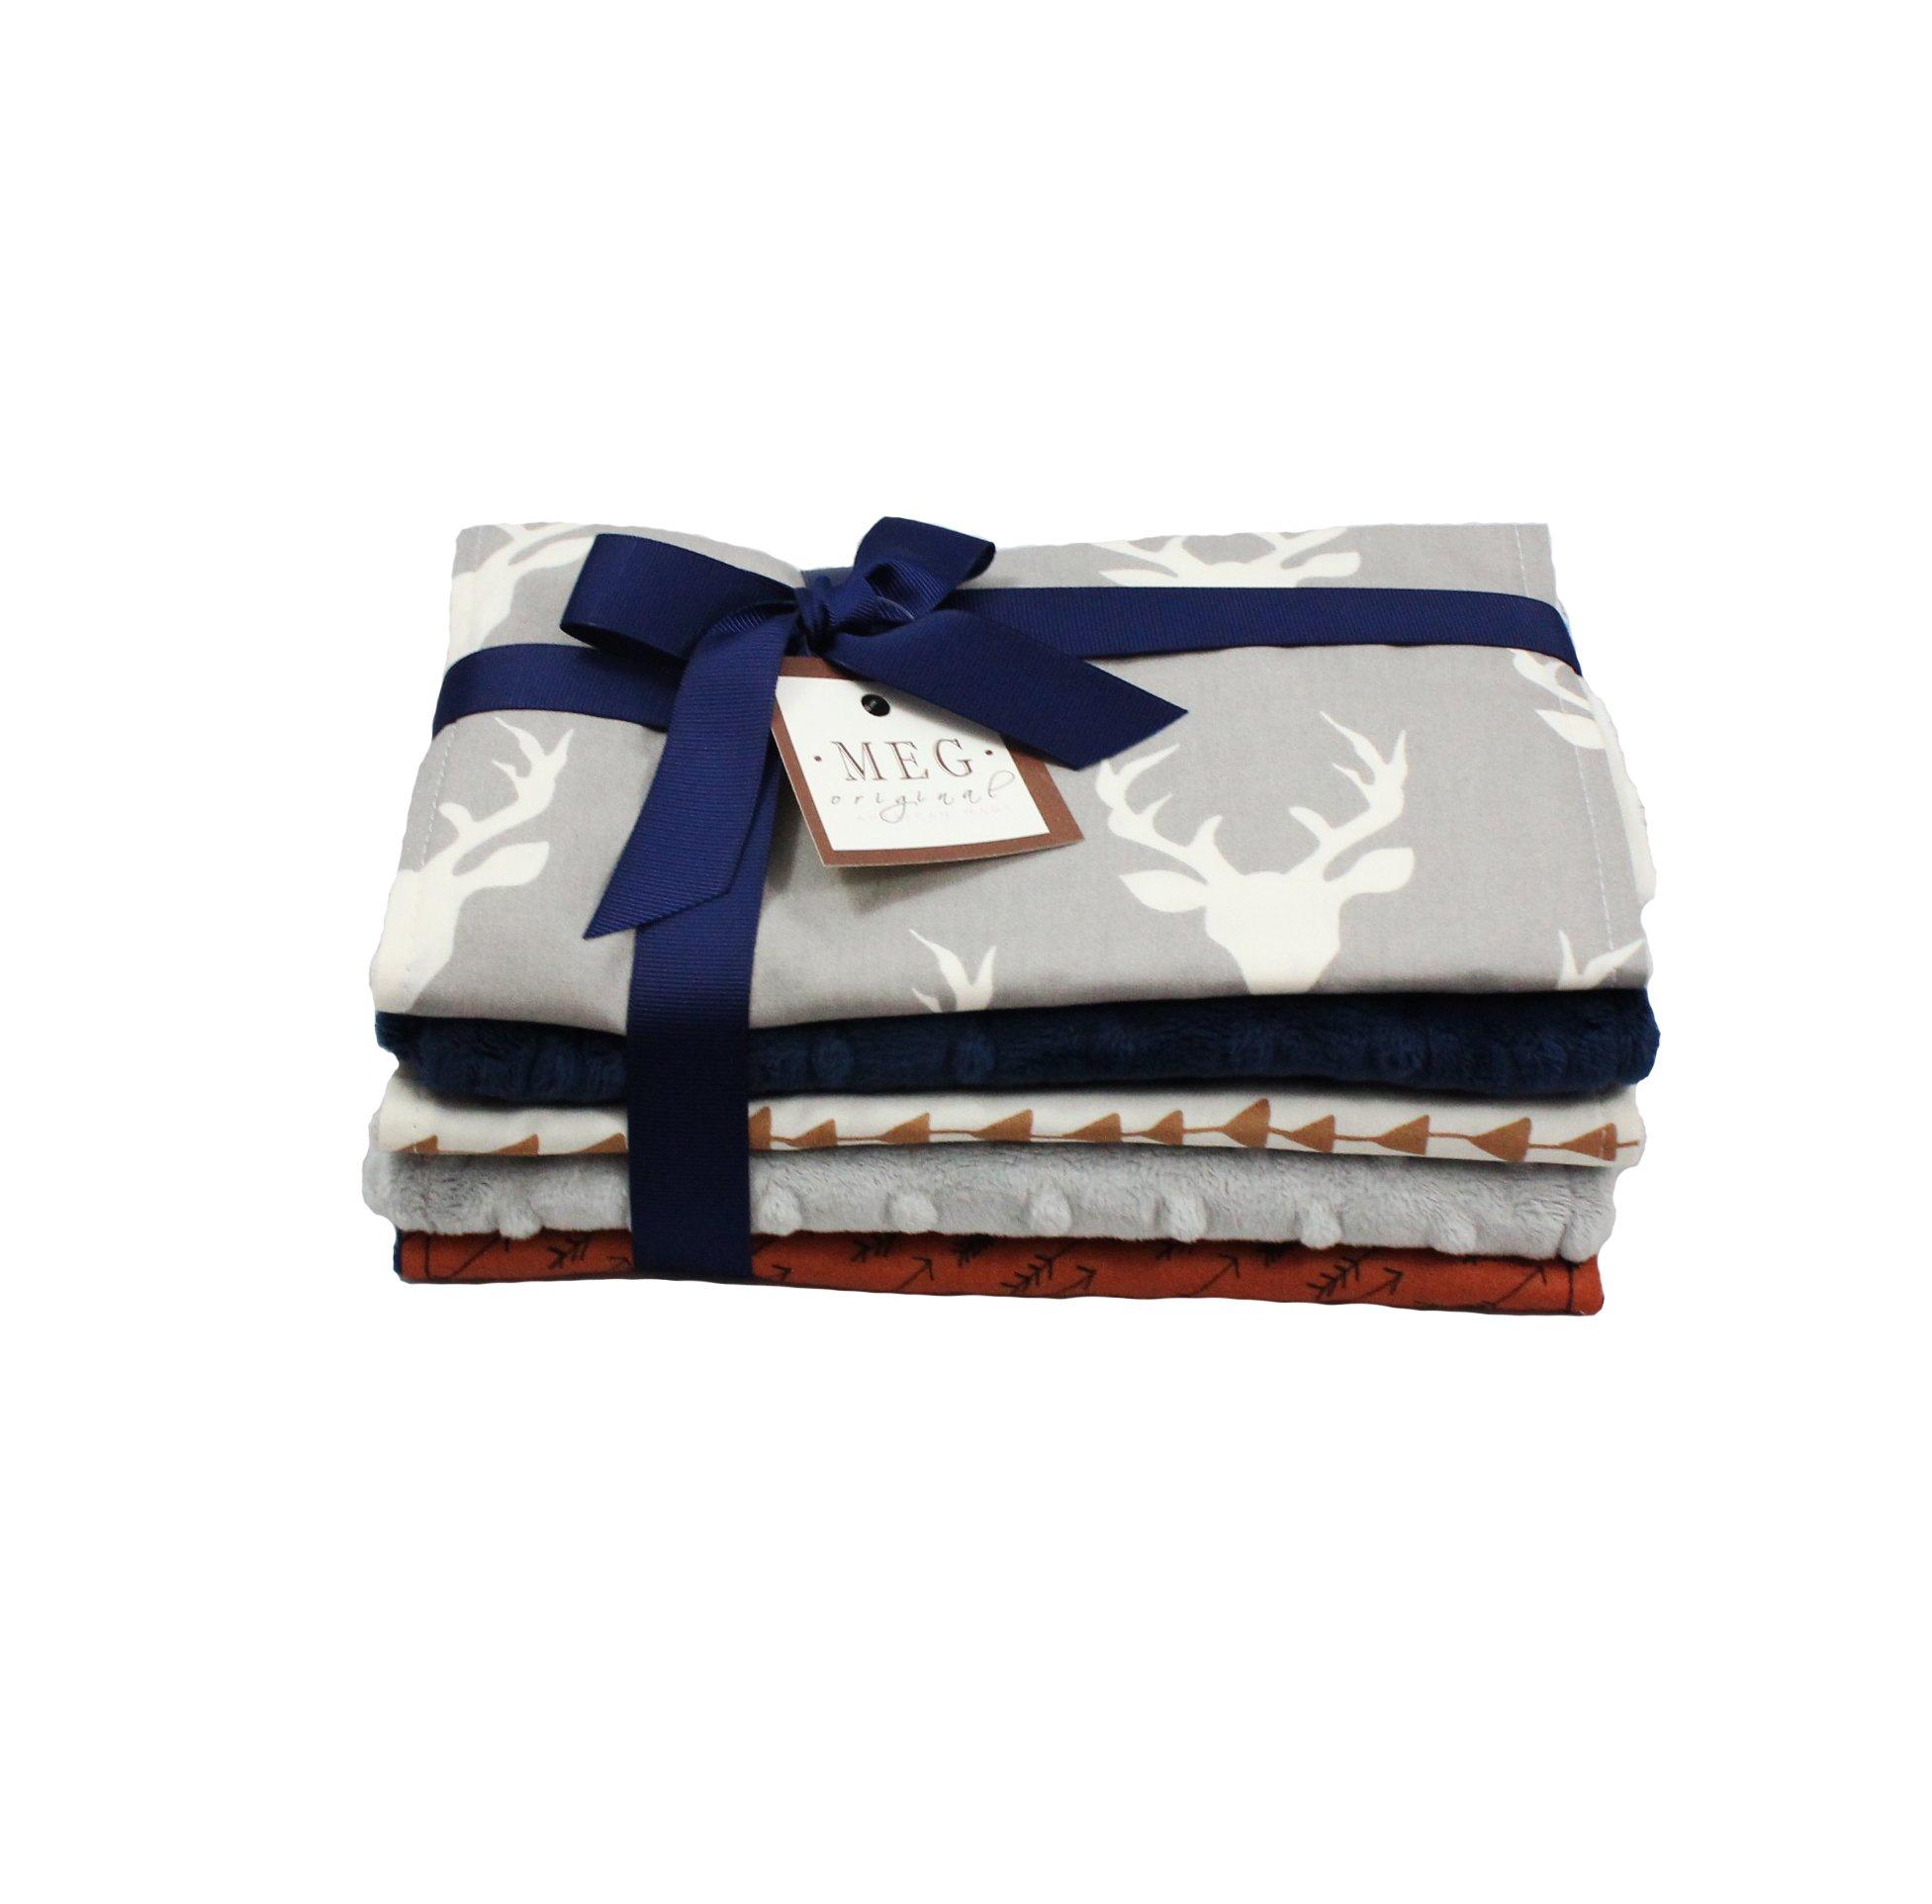 Deer & Arrows -Archer- Baby Boy Burp Cloth Set of 5, MEG Original 174 by MEG Original